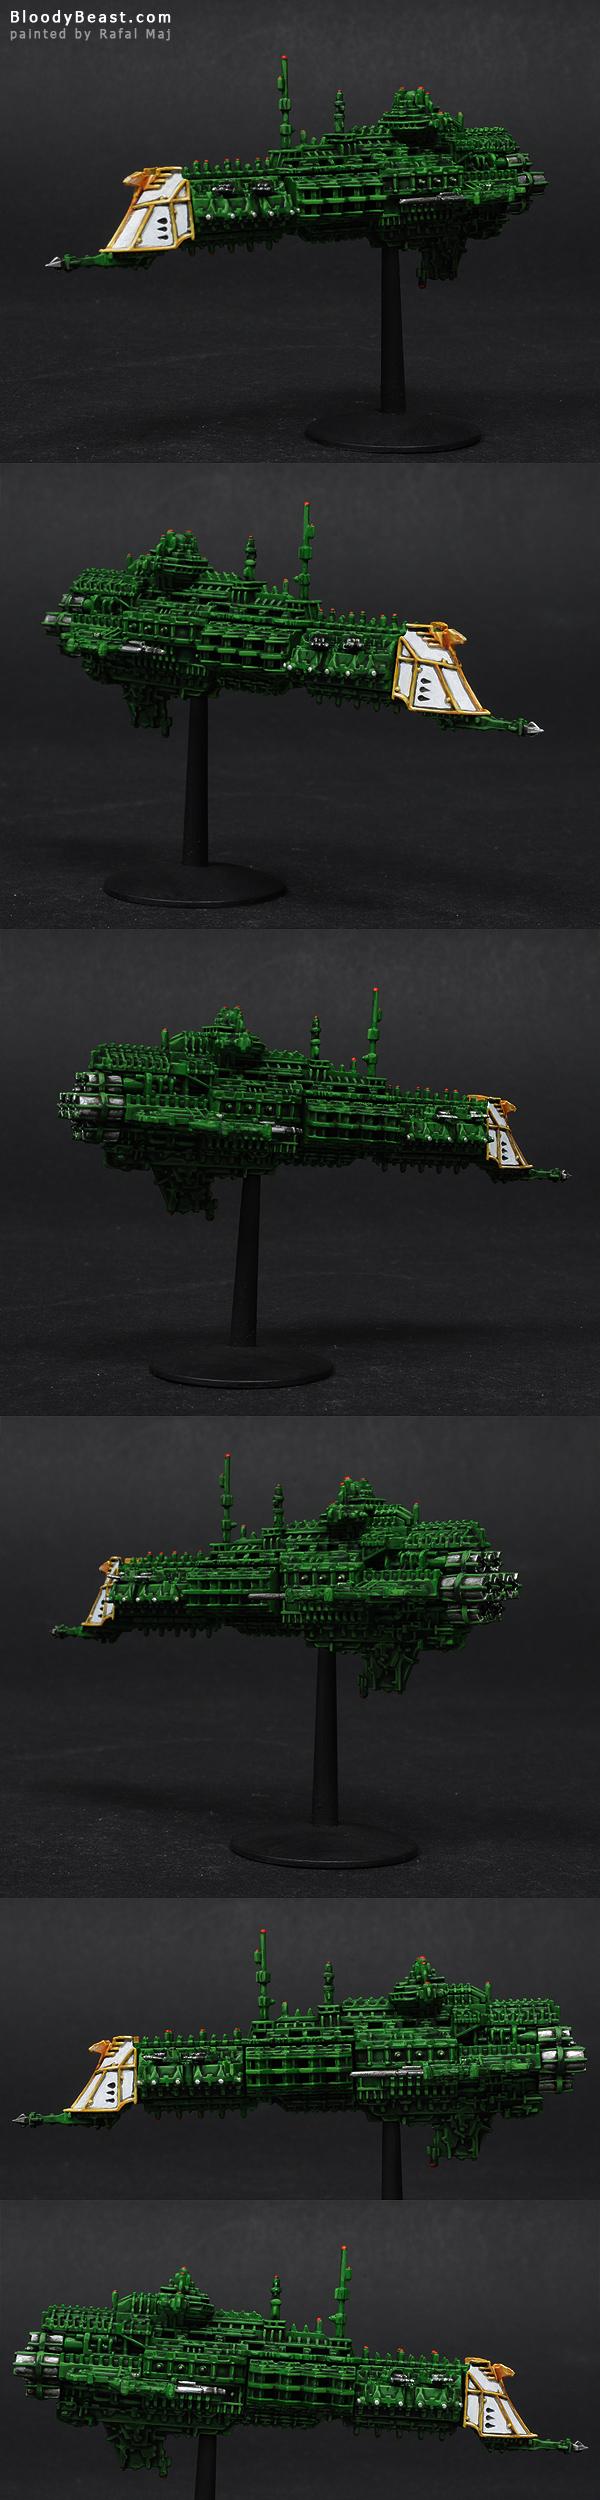 Battlefleet Gothic Imperial Crusier painted by Rafal Maj (BloodyBeast.com)